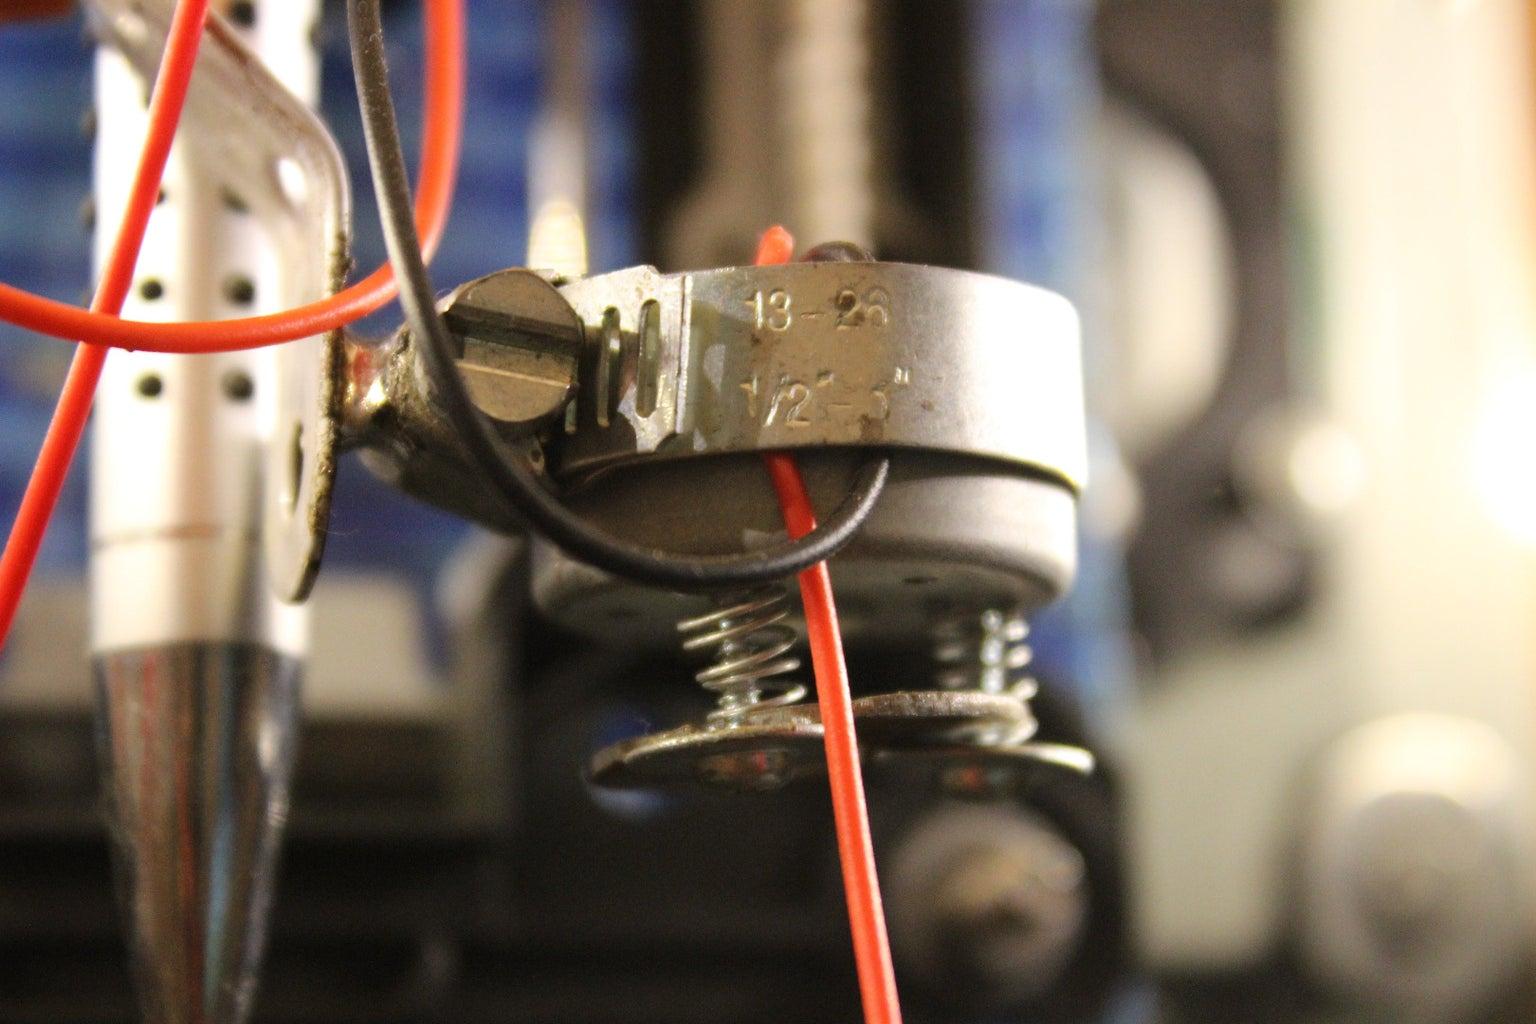 Build the Laser Module